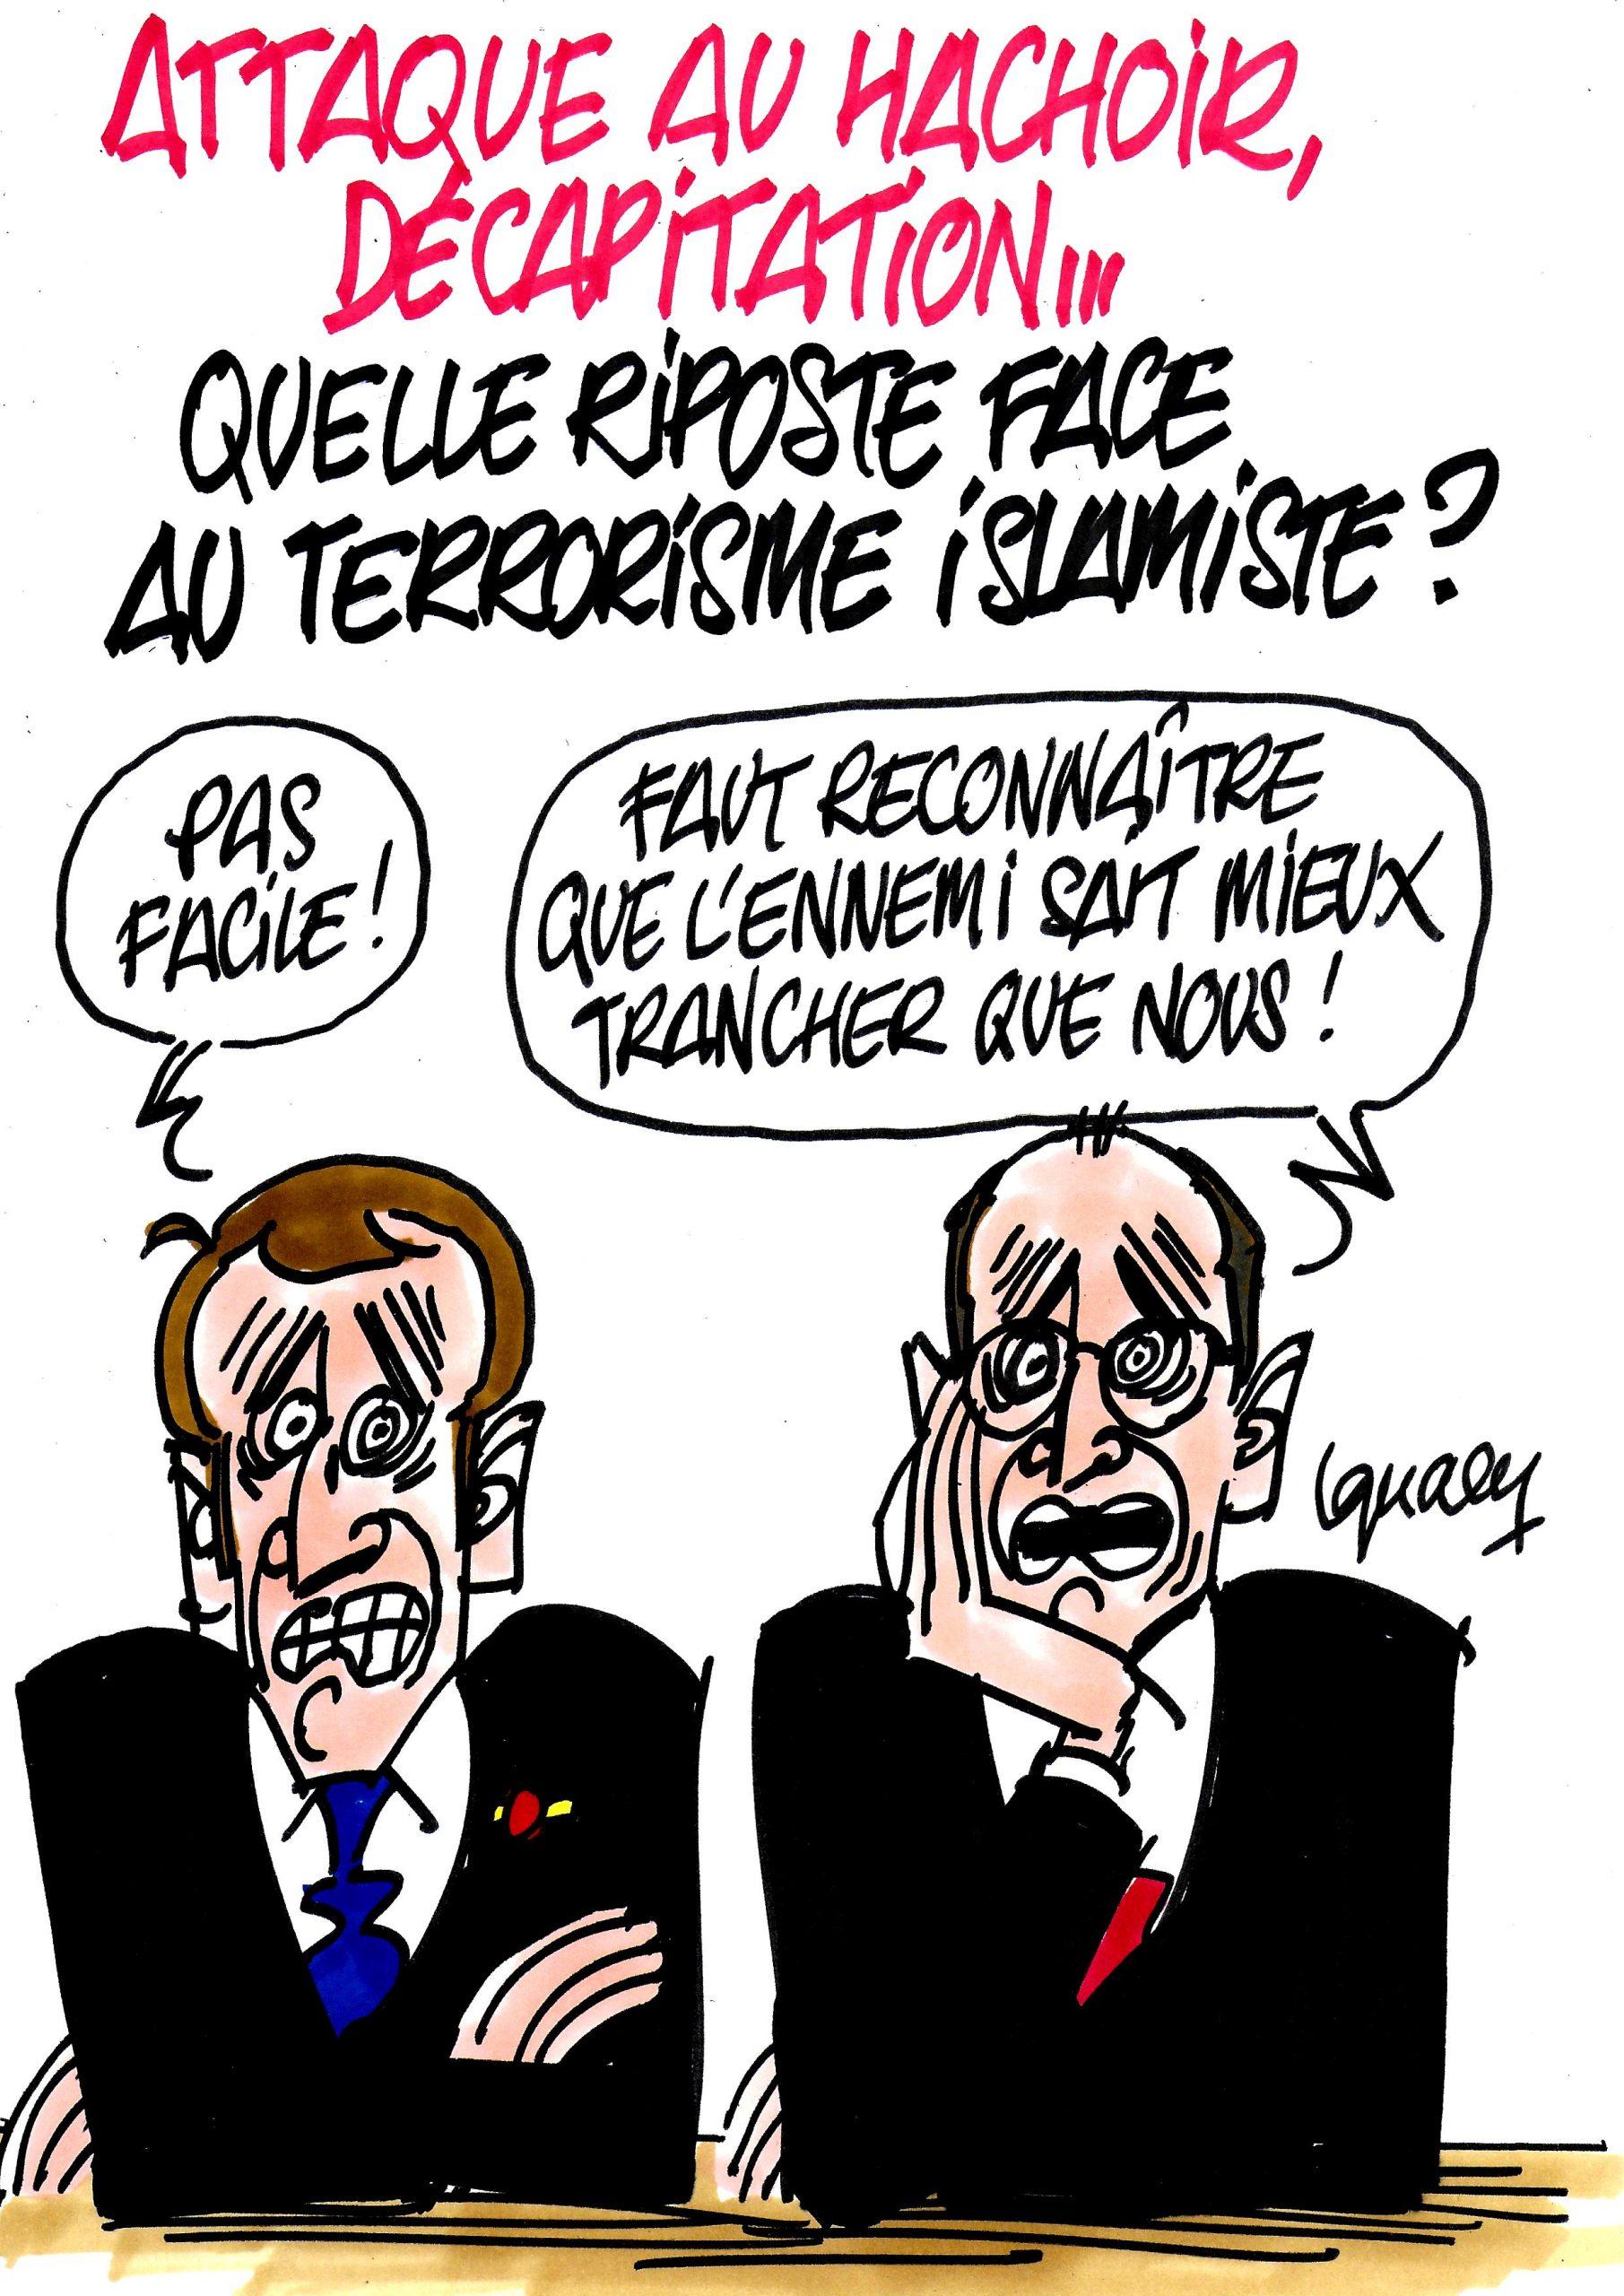 Ignace - Quelle riposte face au terrorisme islamiste ?